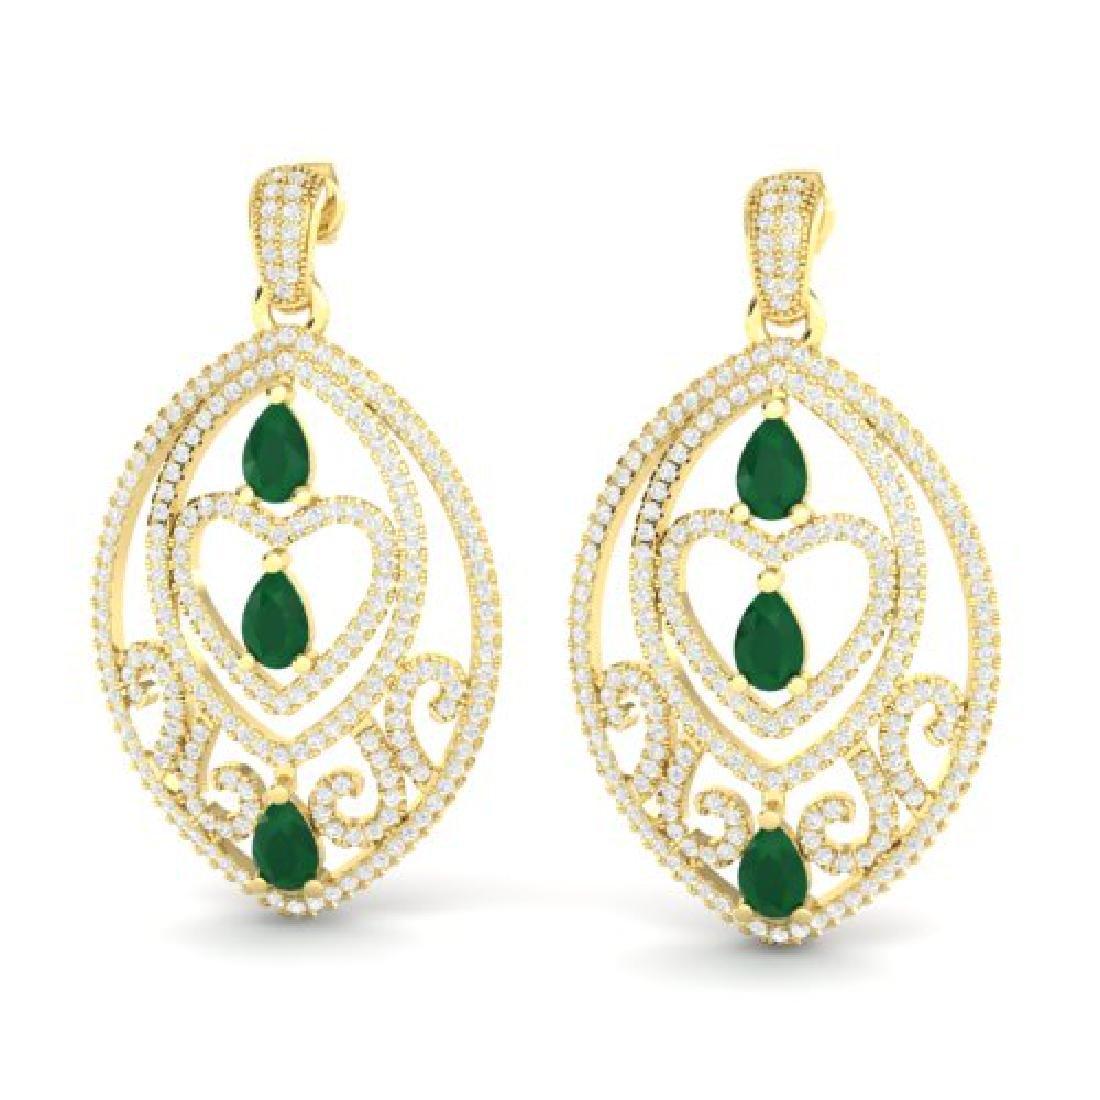 7 CTW Emerald & Micro Pave VS/SI Diamond Heart Earrings